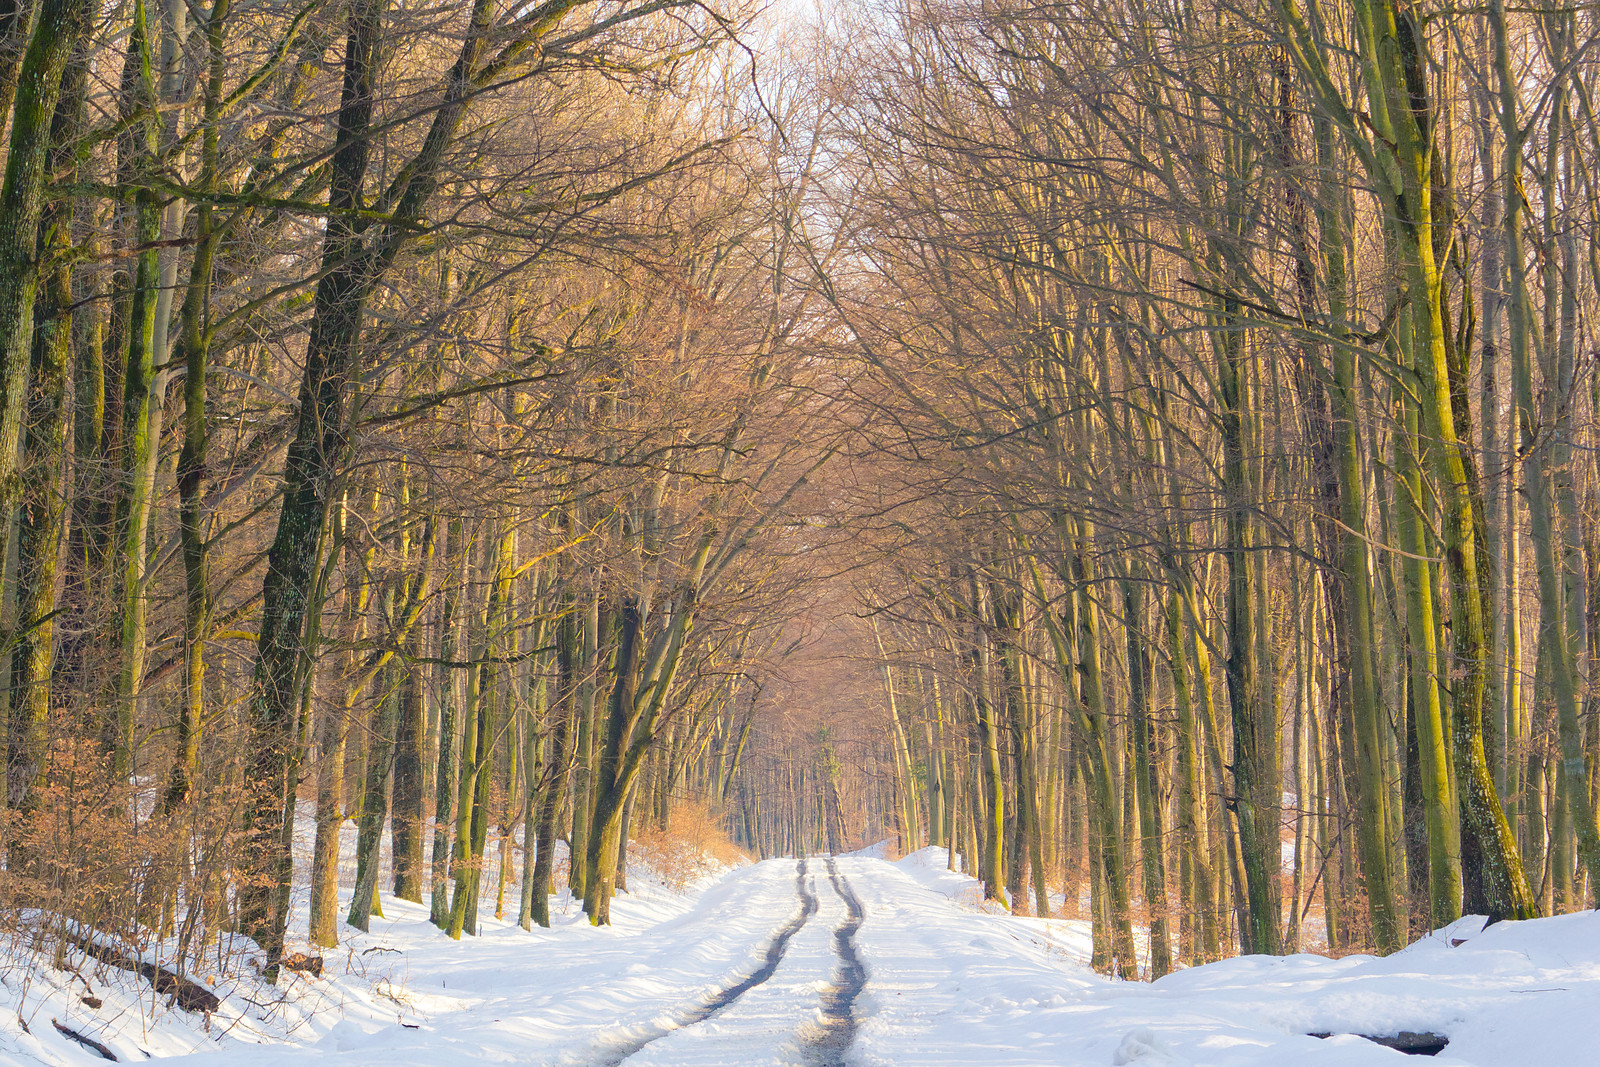 Snowy winding road near Vétyem